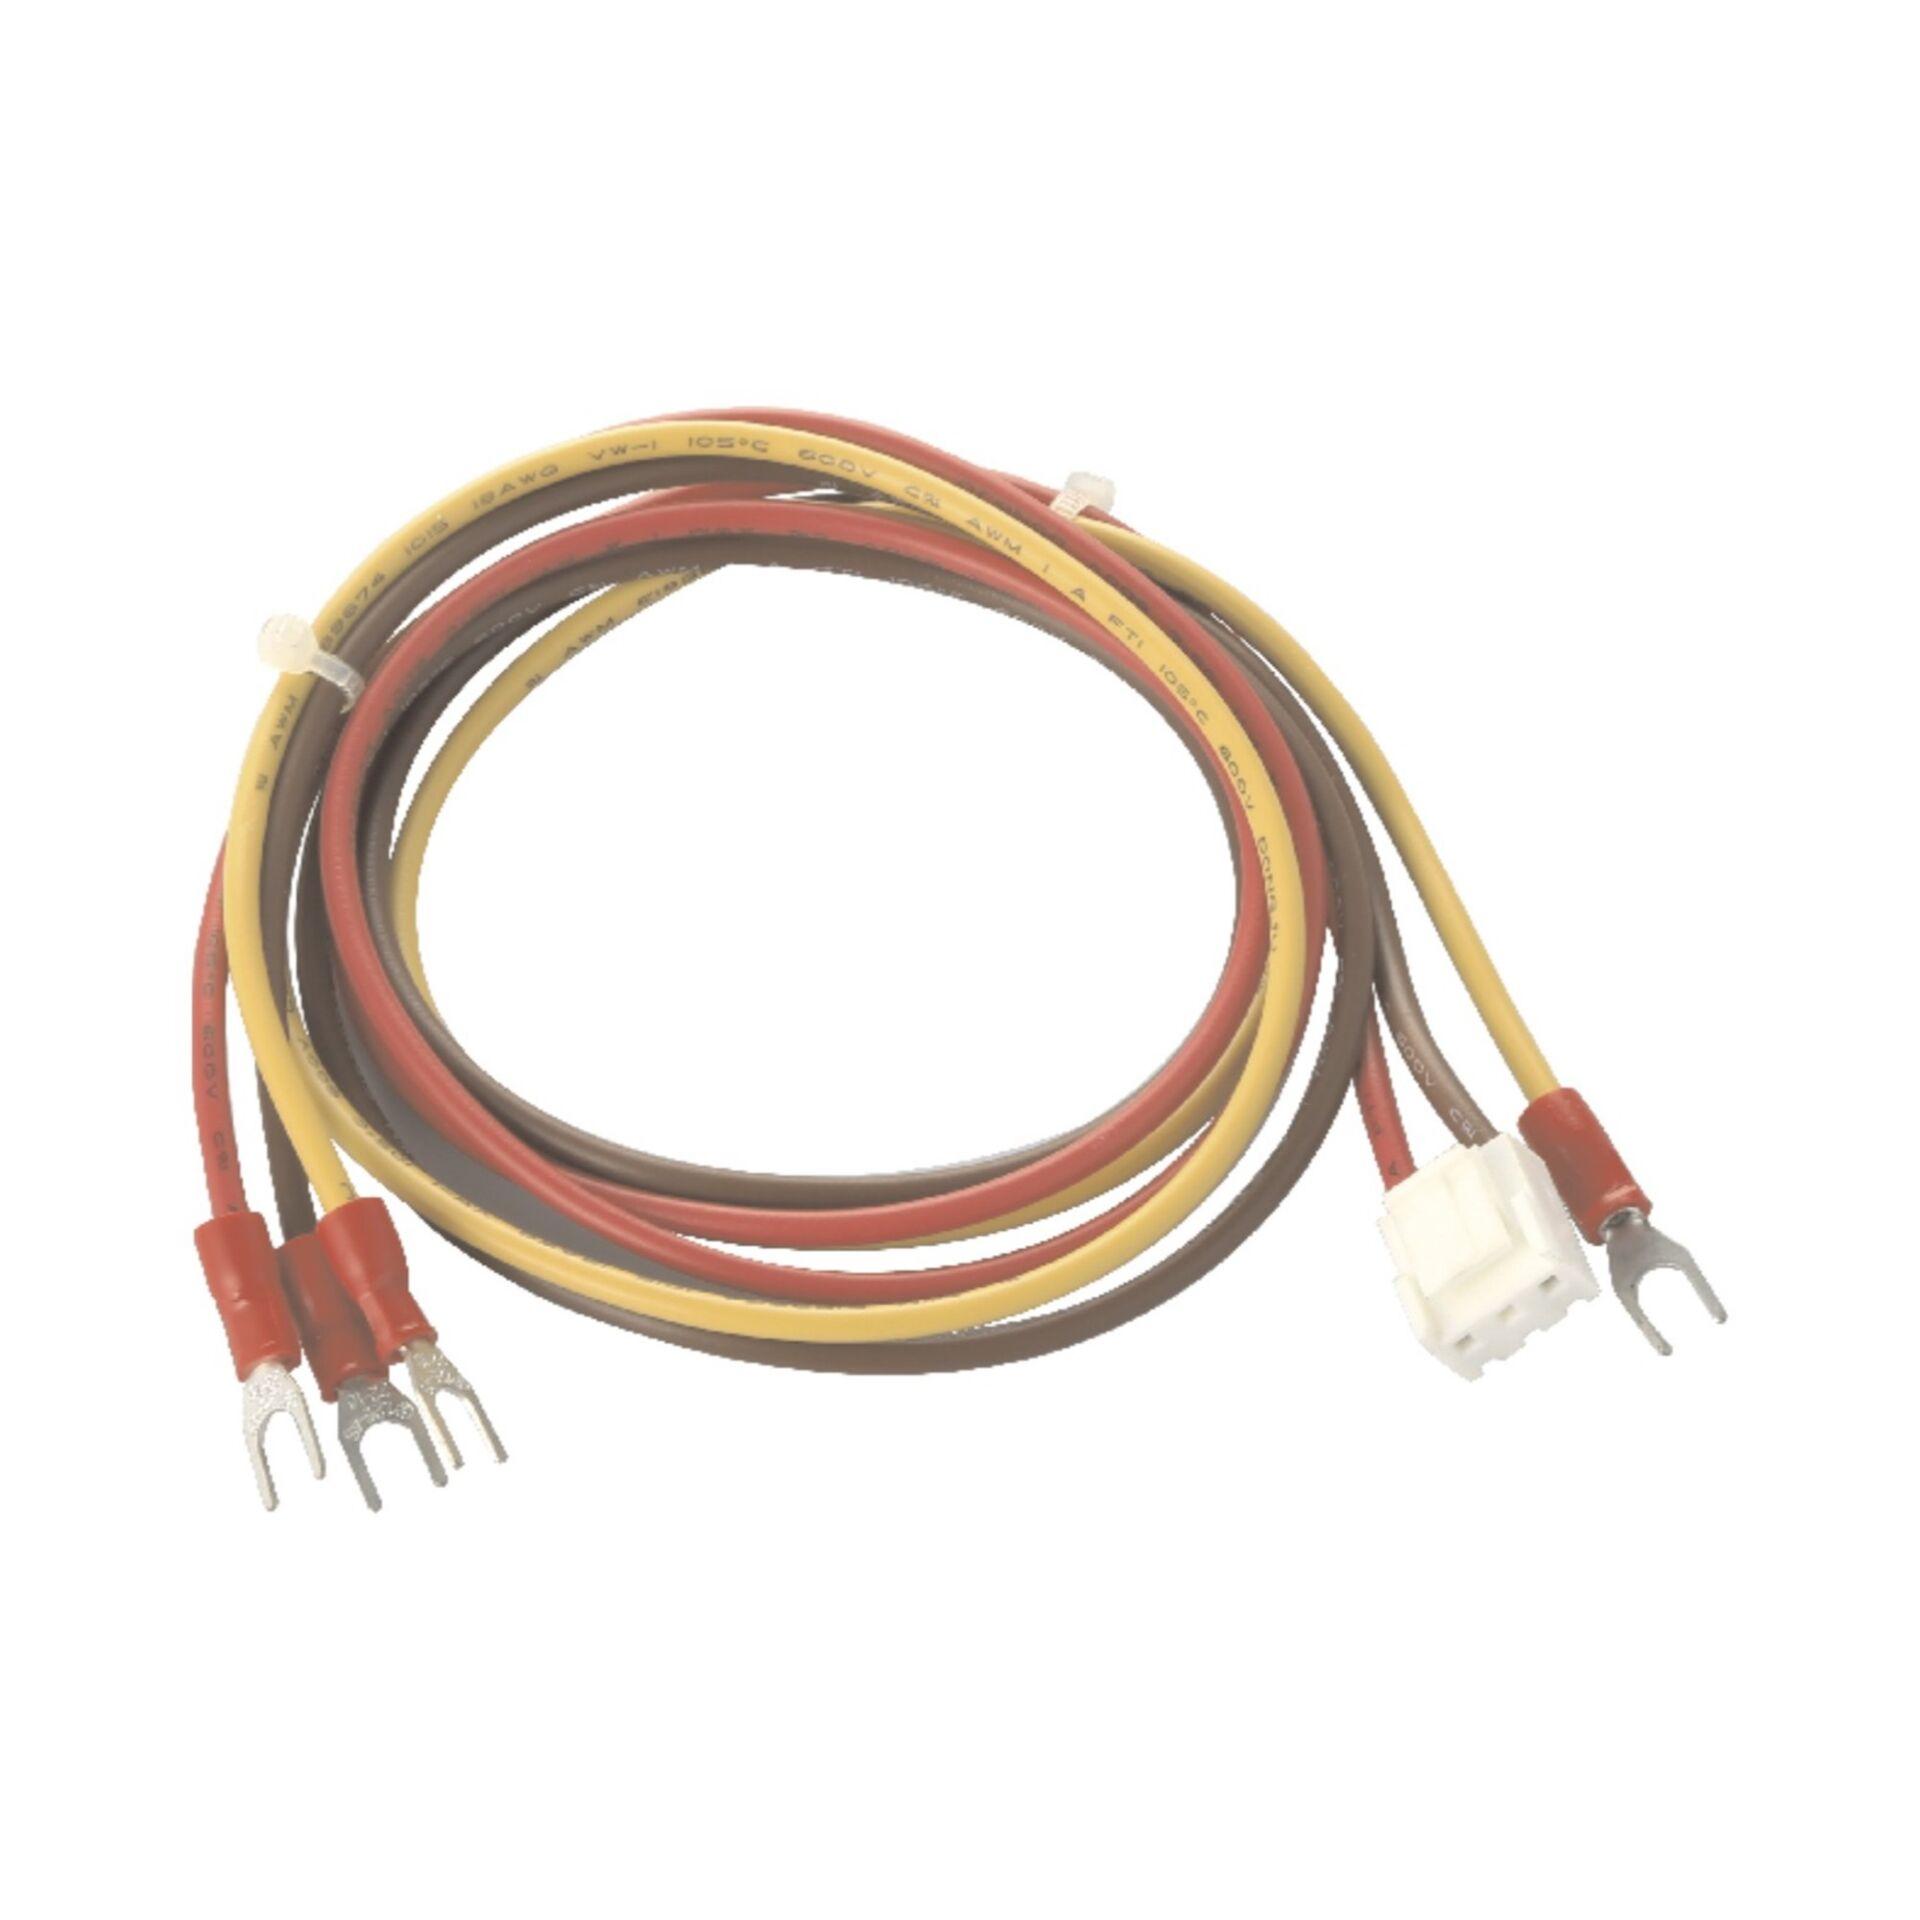 UL1015 18AWG 棕紅(黃綠)/單邊壓VH-3Y膠殼/含頭壓線/棕紅接膠殼,其它接Y型冷壓端子1.25-4S